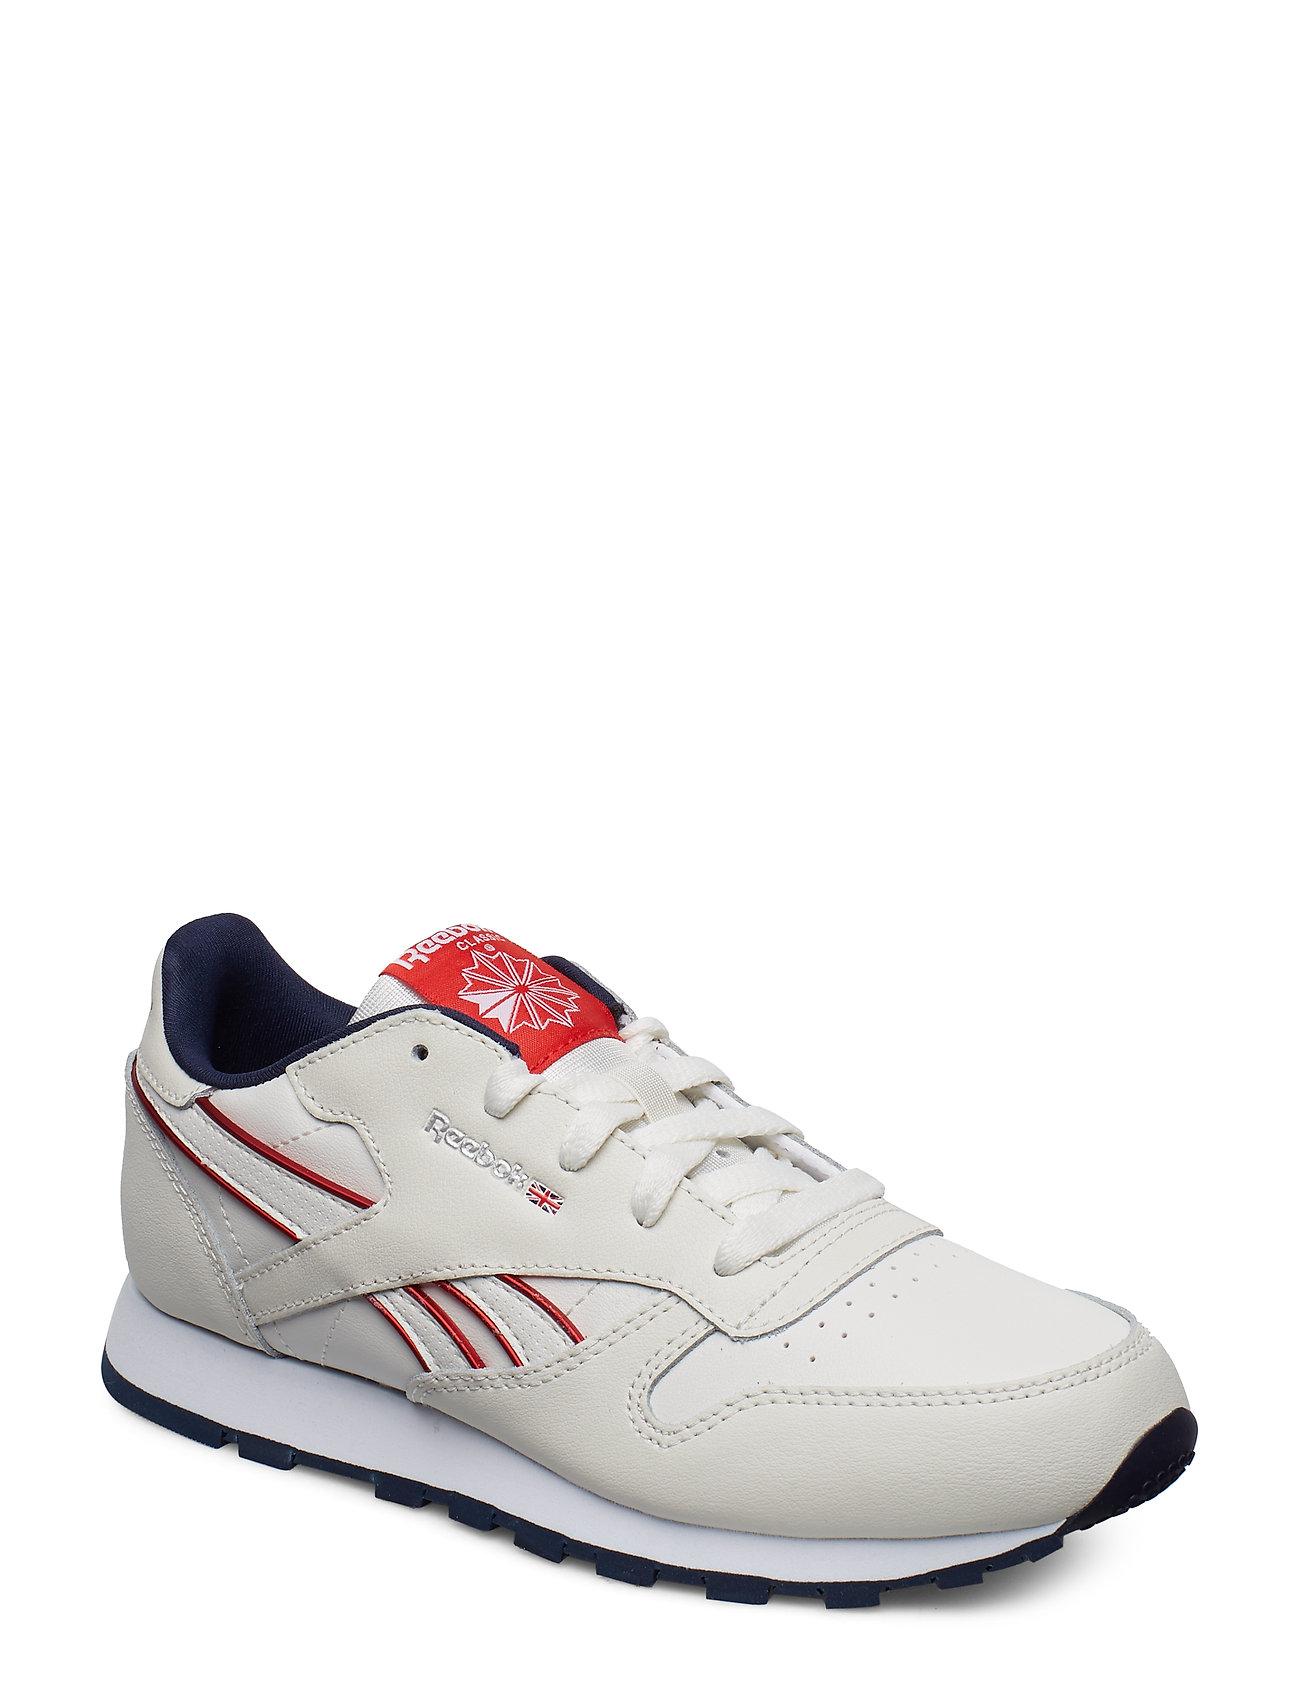 Image of Classic Leather Sneakers Sko Hvid Reebok Classics (3215336365)